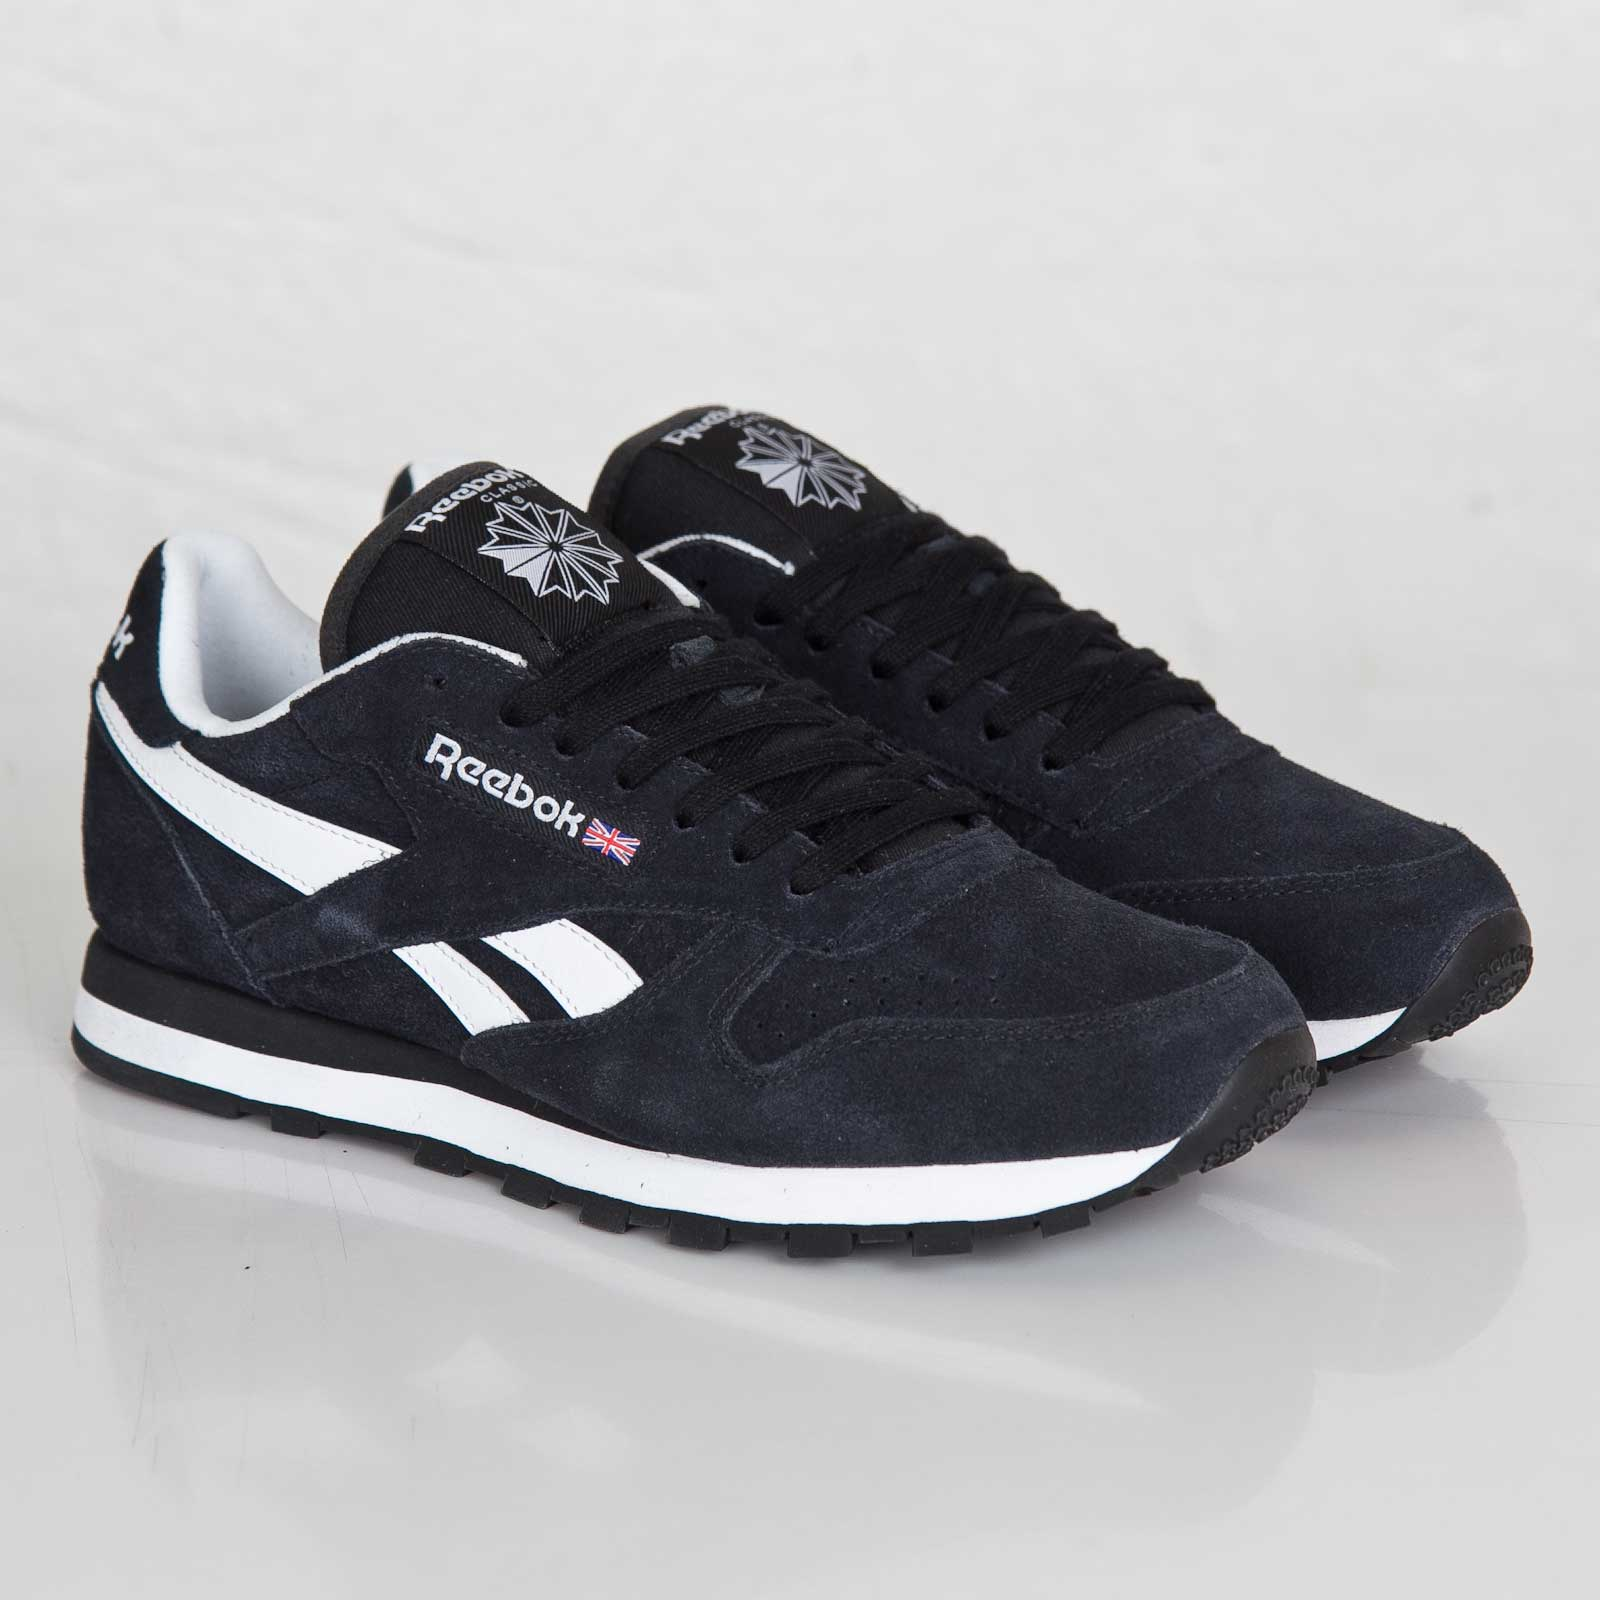 ae4b4ae1b Reebok Classic Leather Suede - M43016 - Sneakersnstuff | sneakers ...